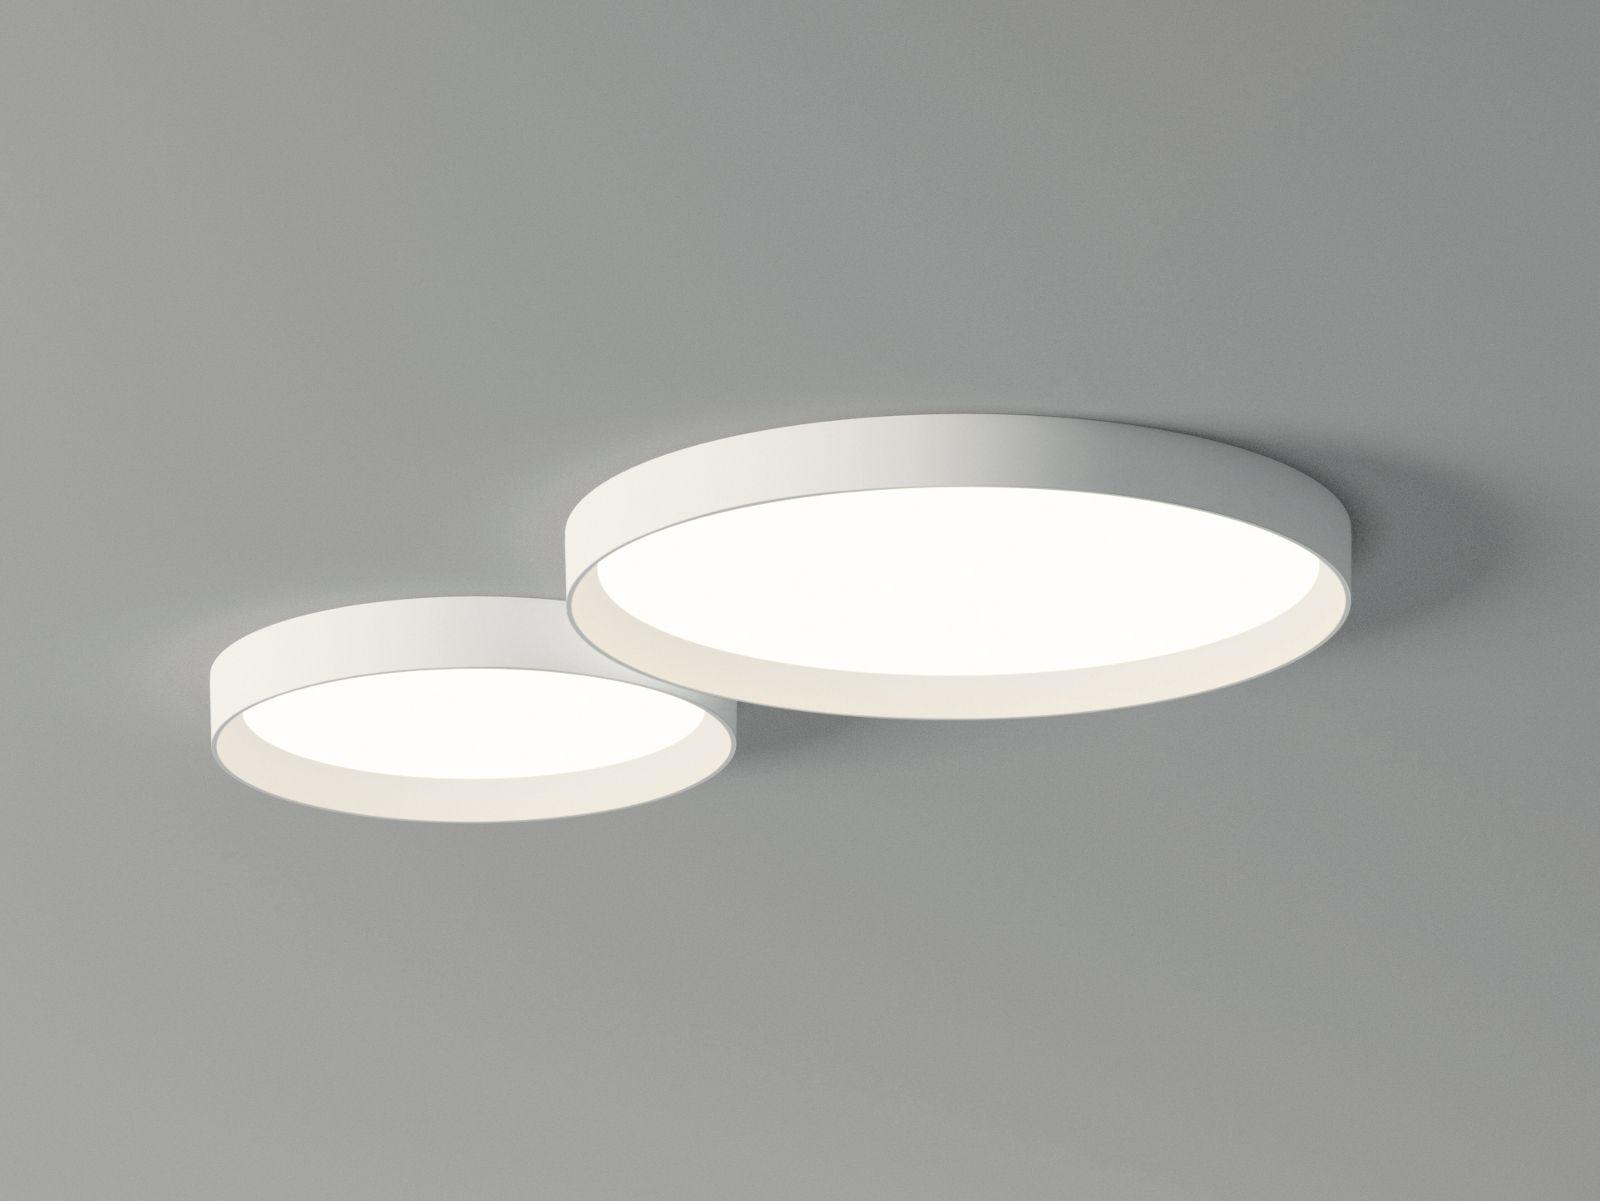 LED Deckenleuchte UP 4442   Vibia